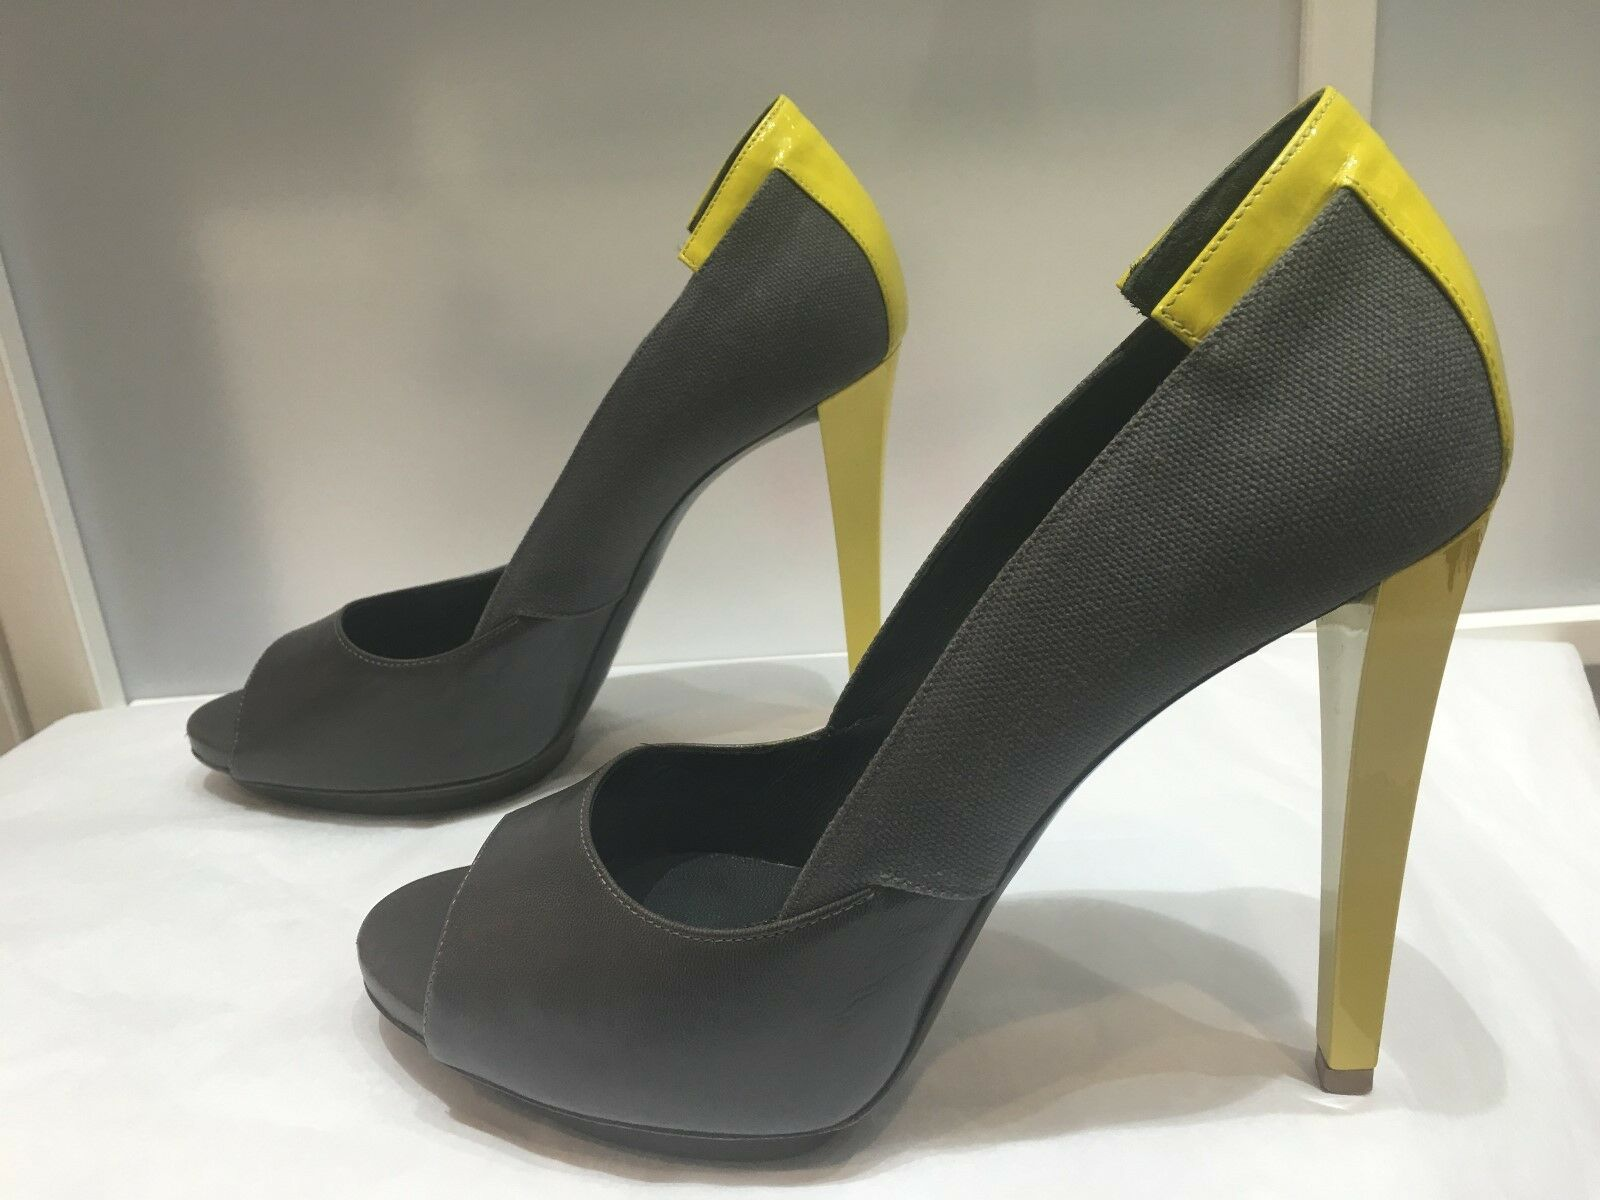 100% authentic Balenciaga Balenciaga Balenciaga open toe platform heels, size 40 b92f8a